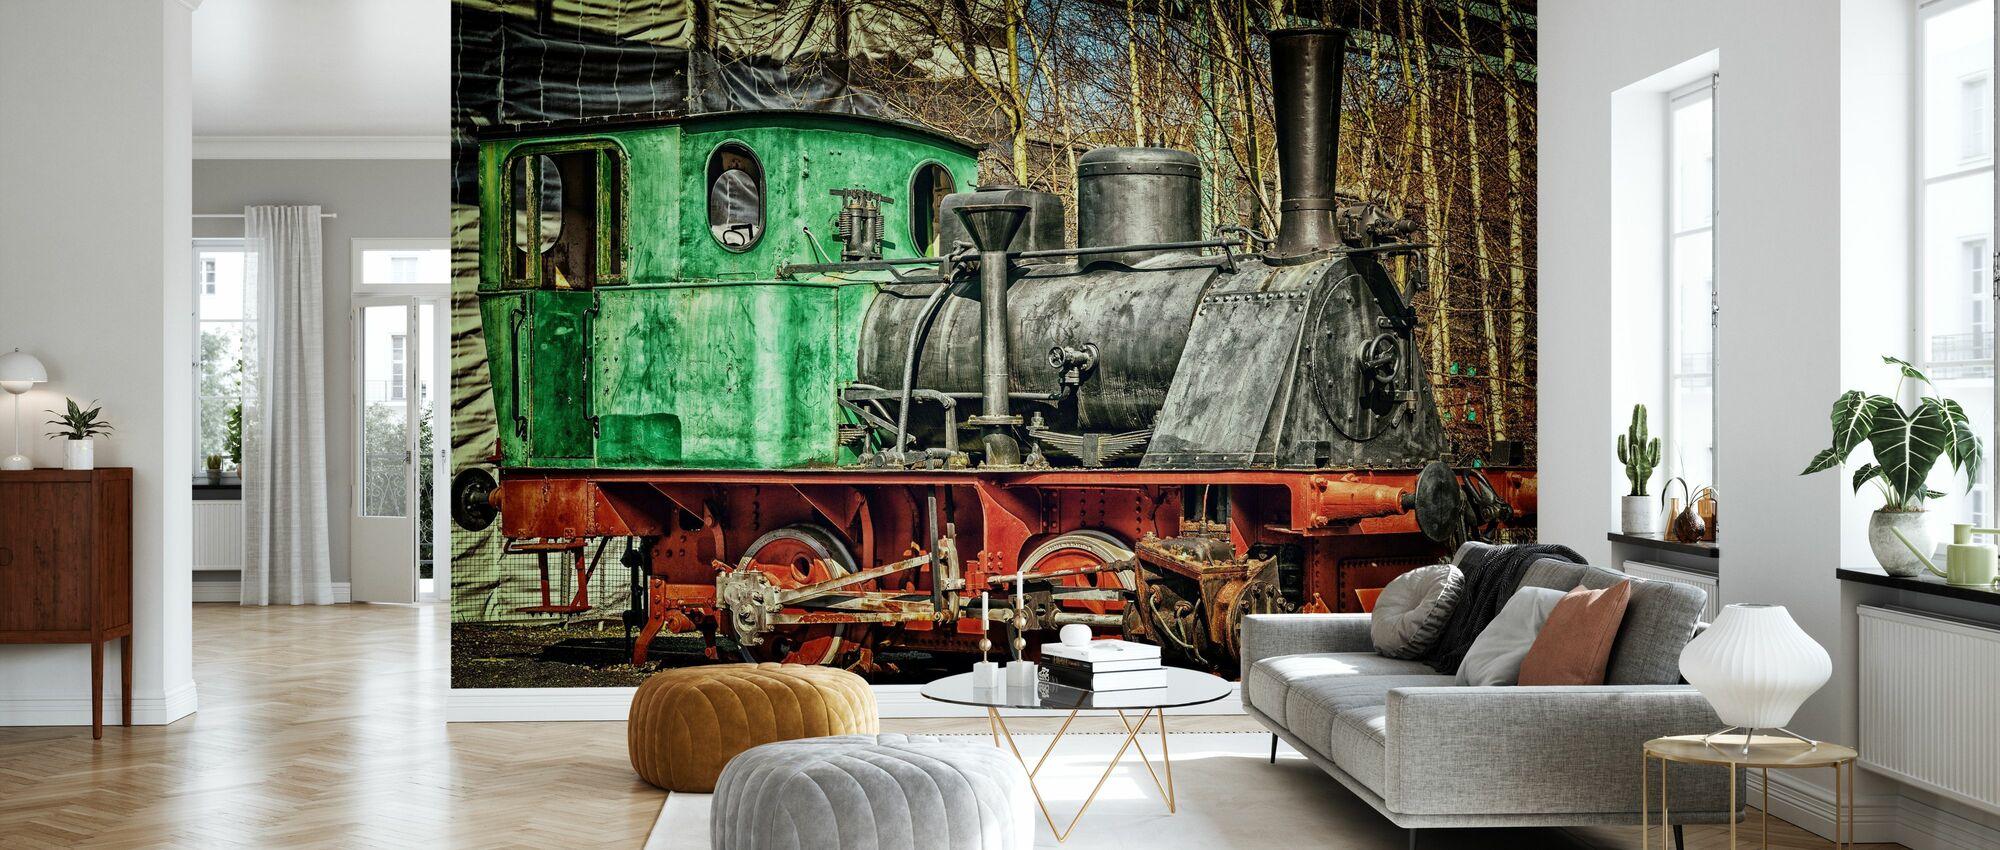 Old Steam Locomotive - Wallpaper - Living Room